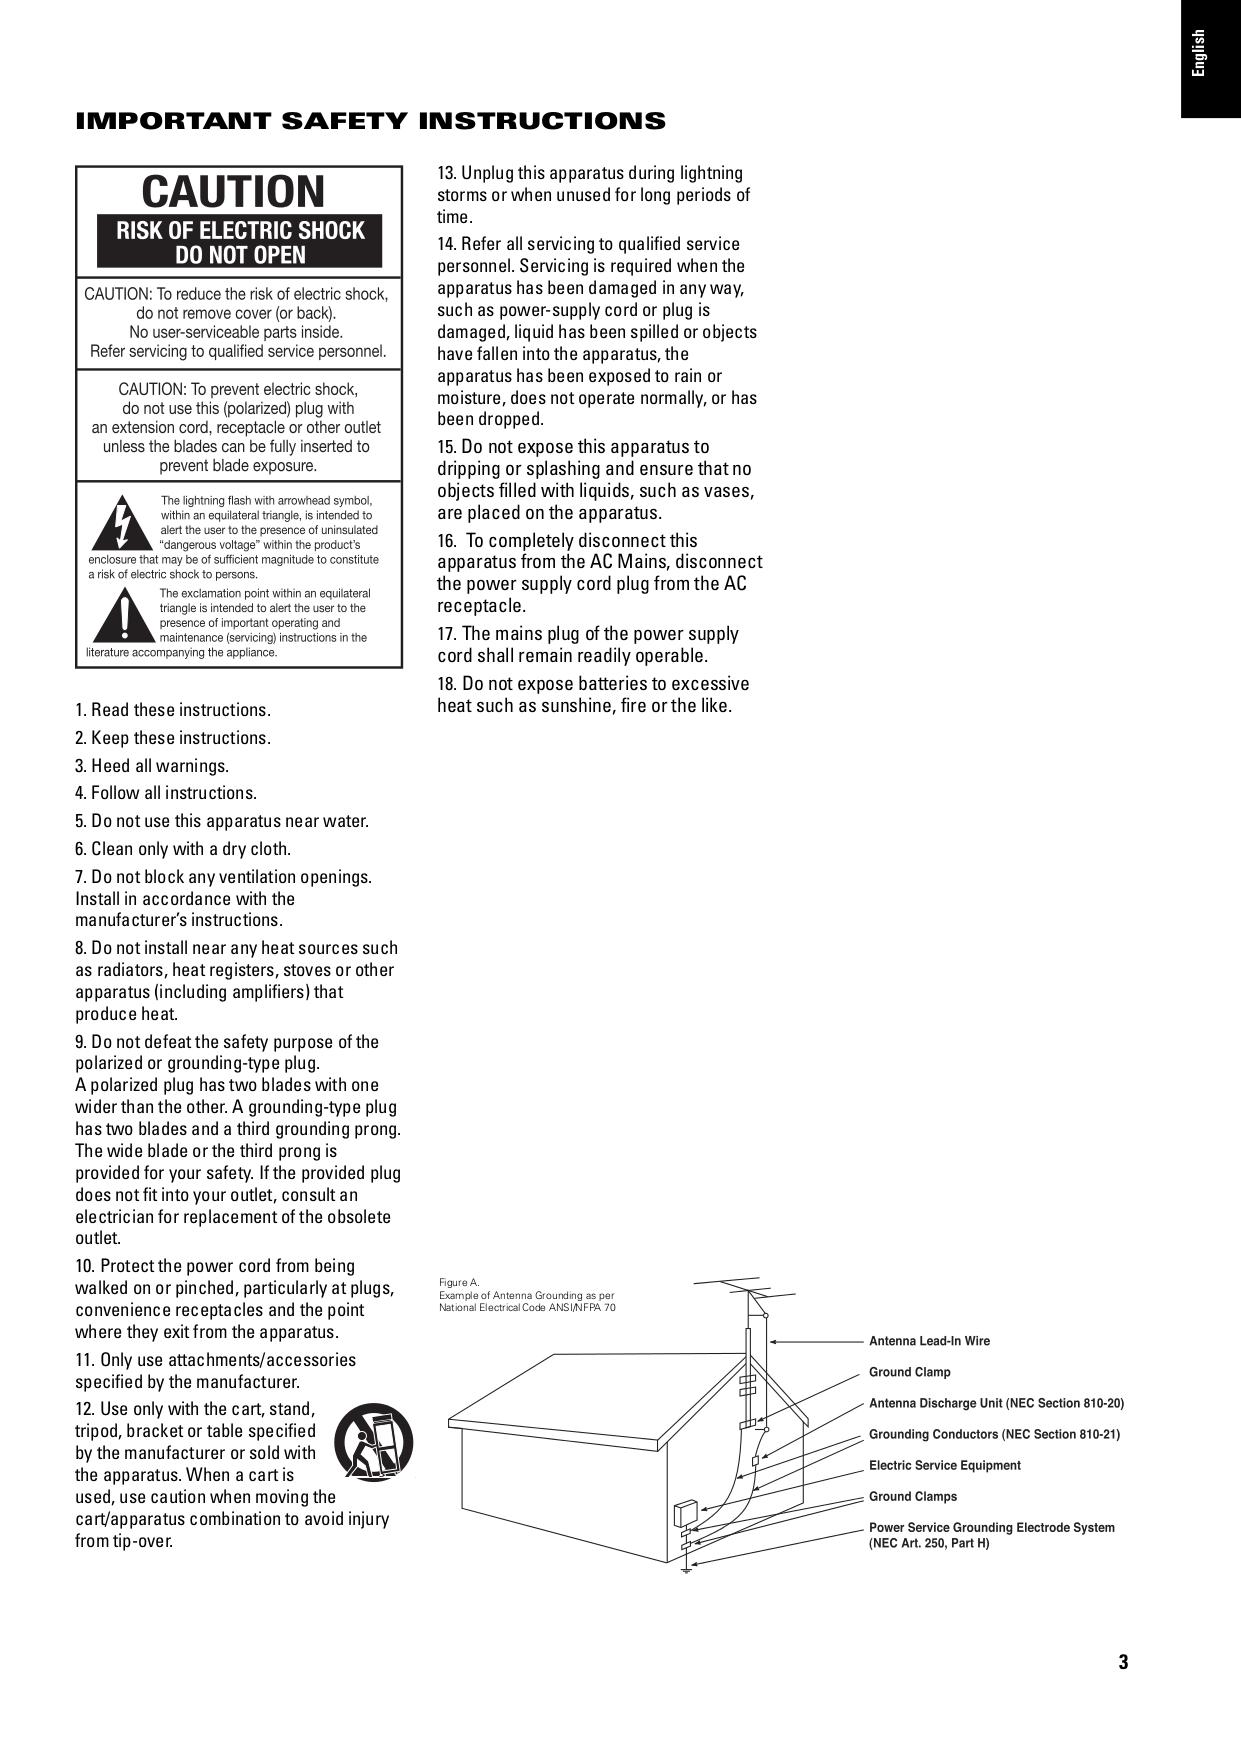 Pdf Manual For Jbl Speaker Control Control 24g